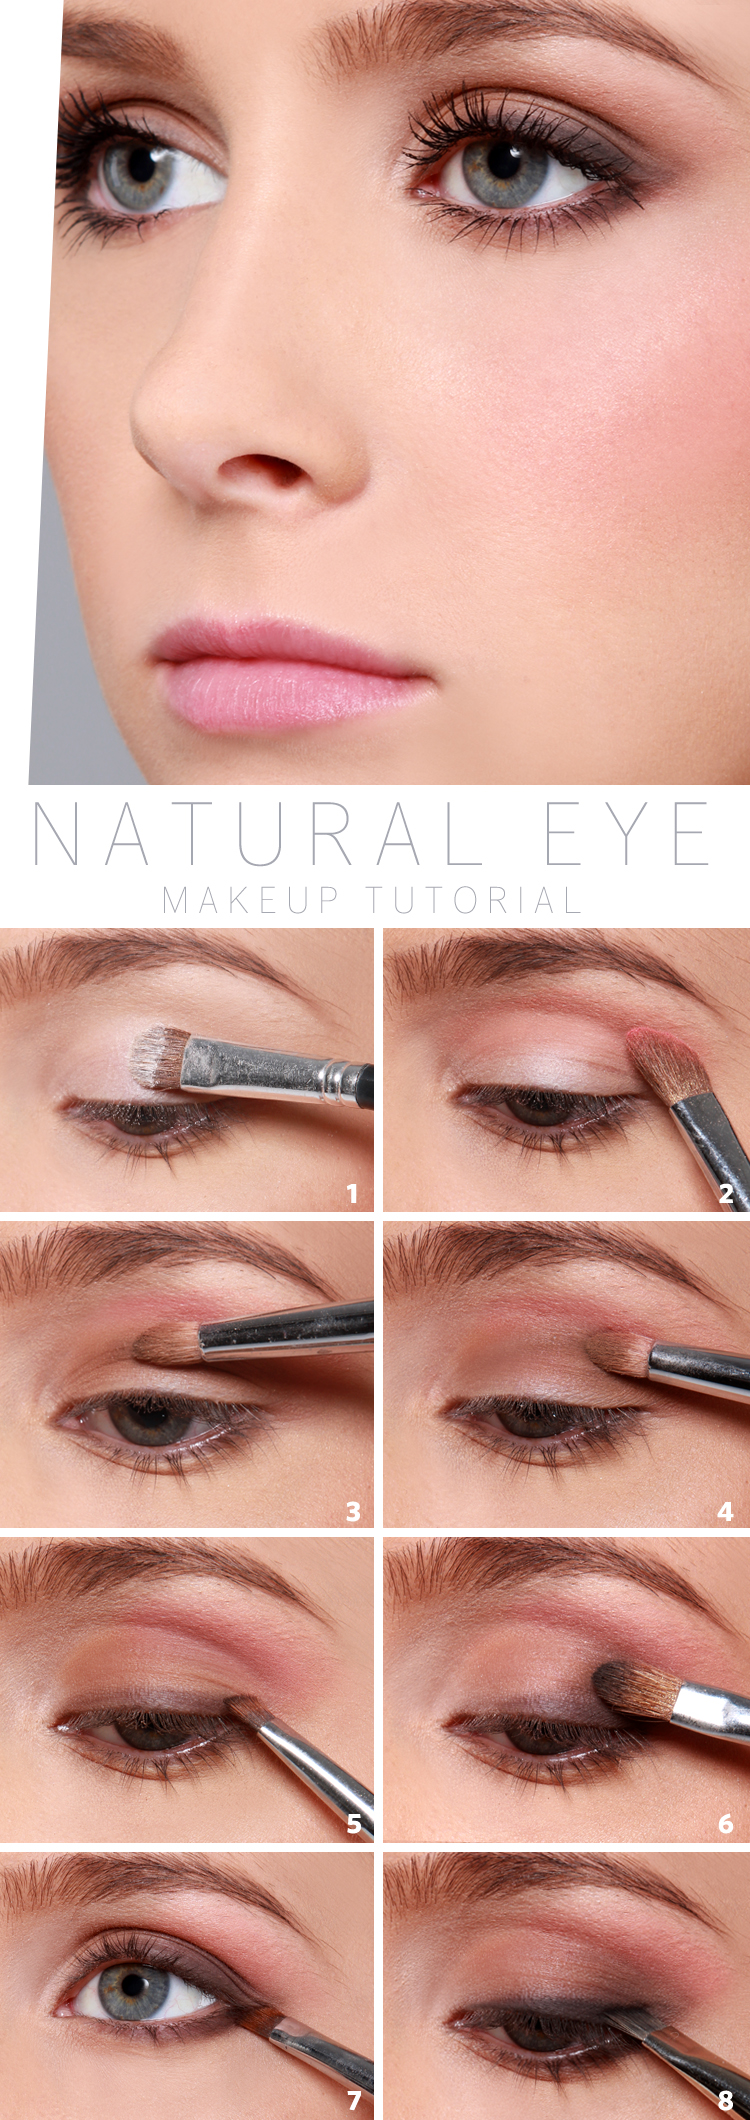 Lulus How,To Natural Eye Makeup Tutorial , Lulus.com